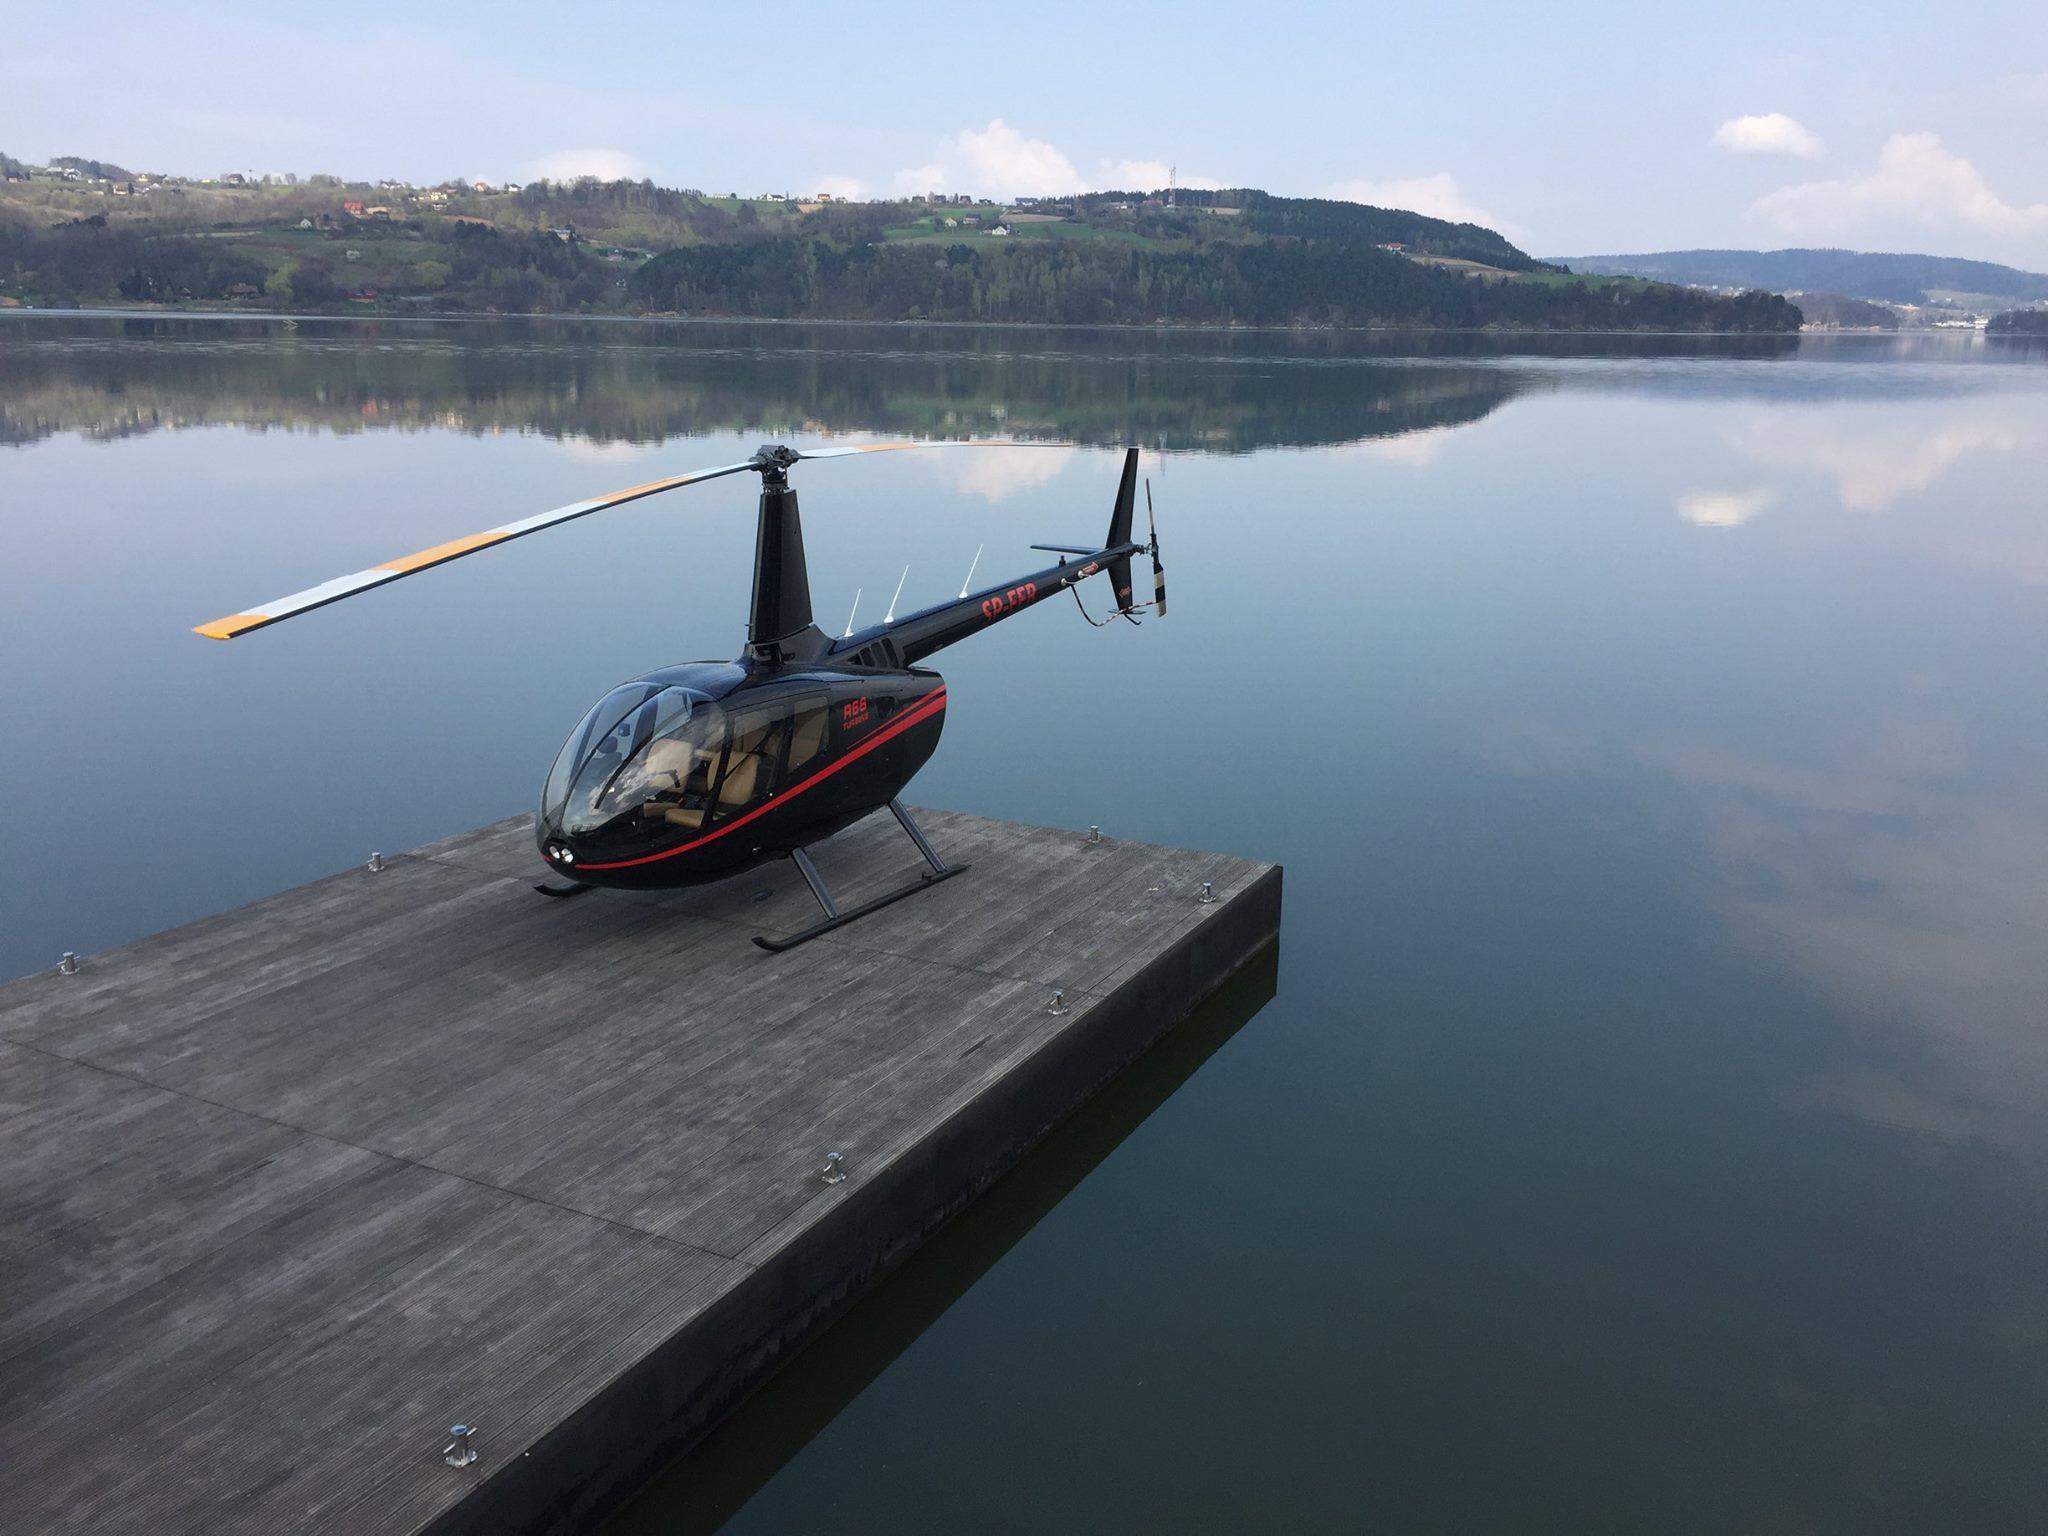 przelot-helikopterem